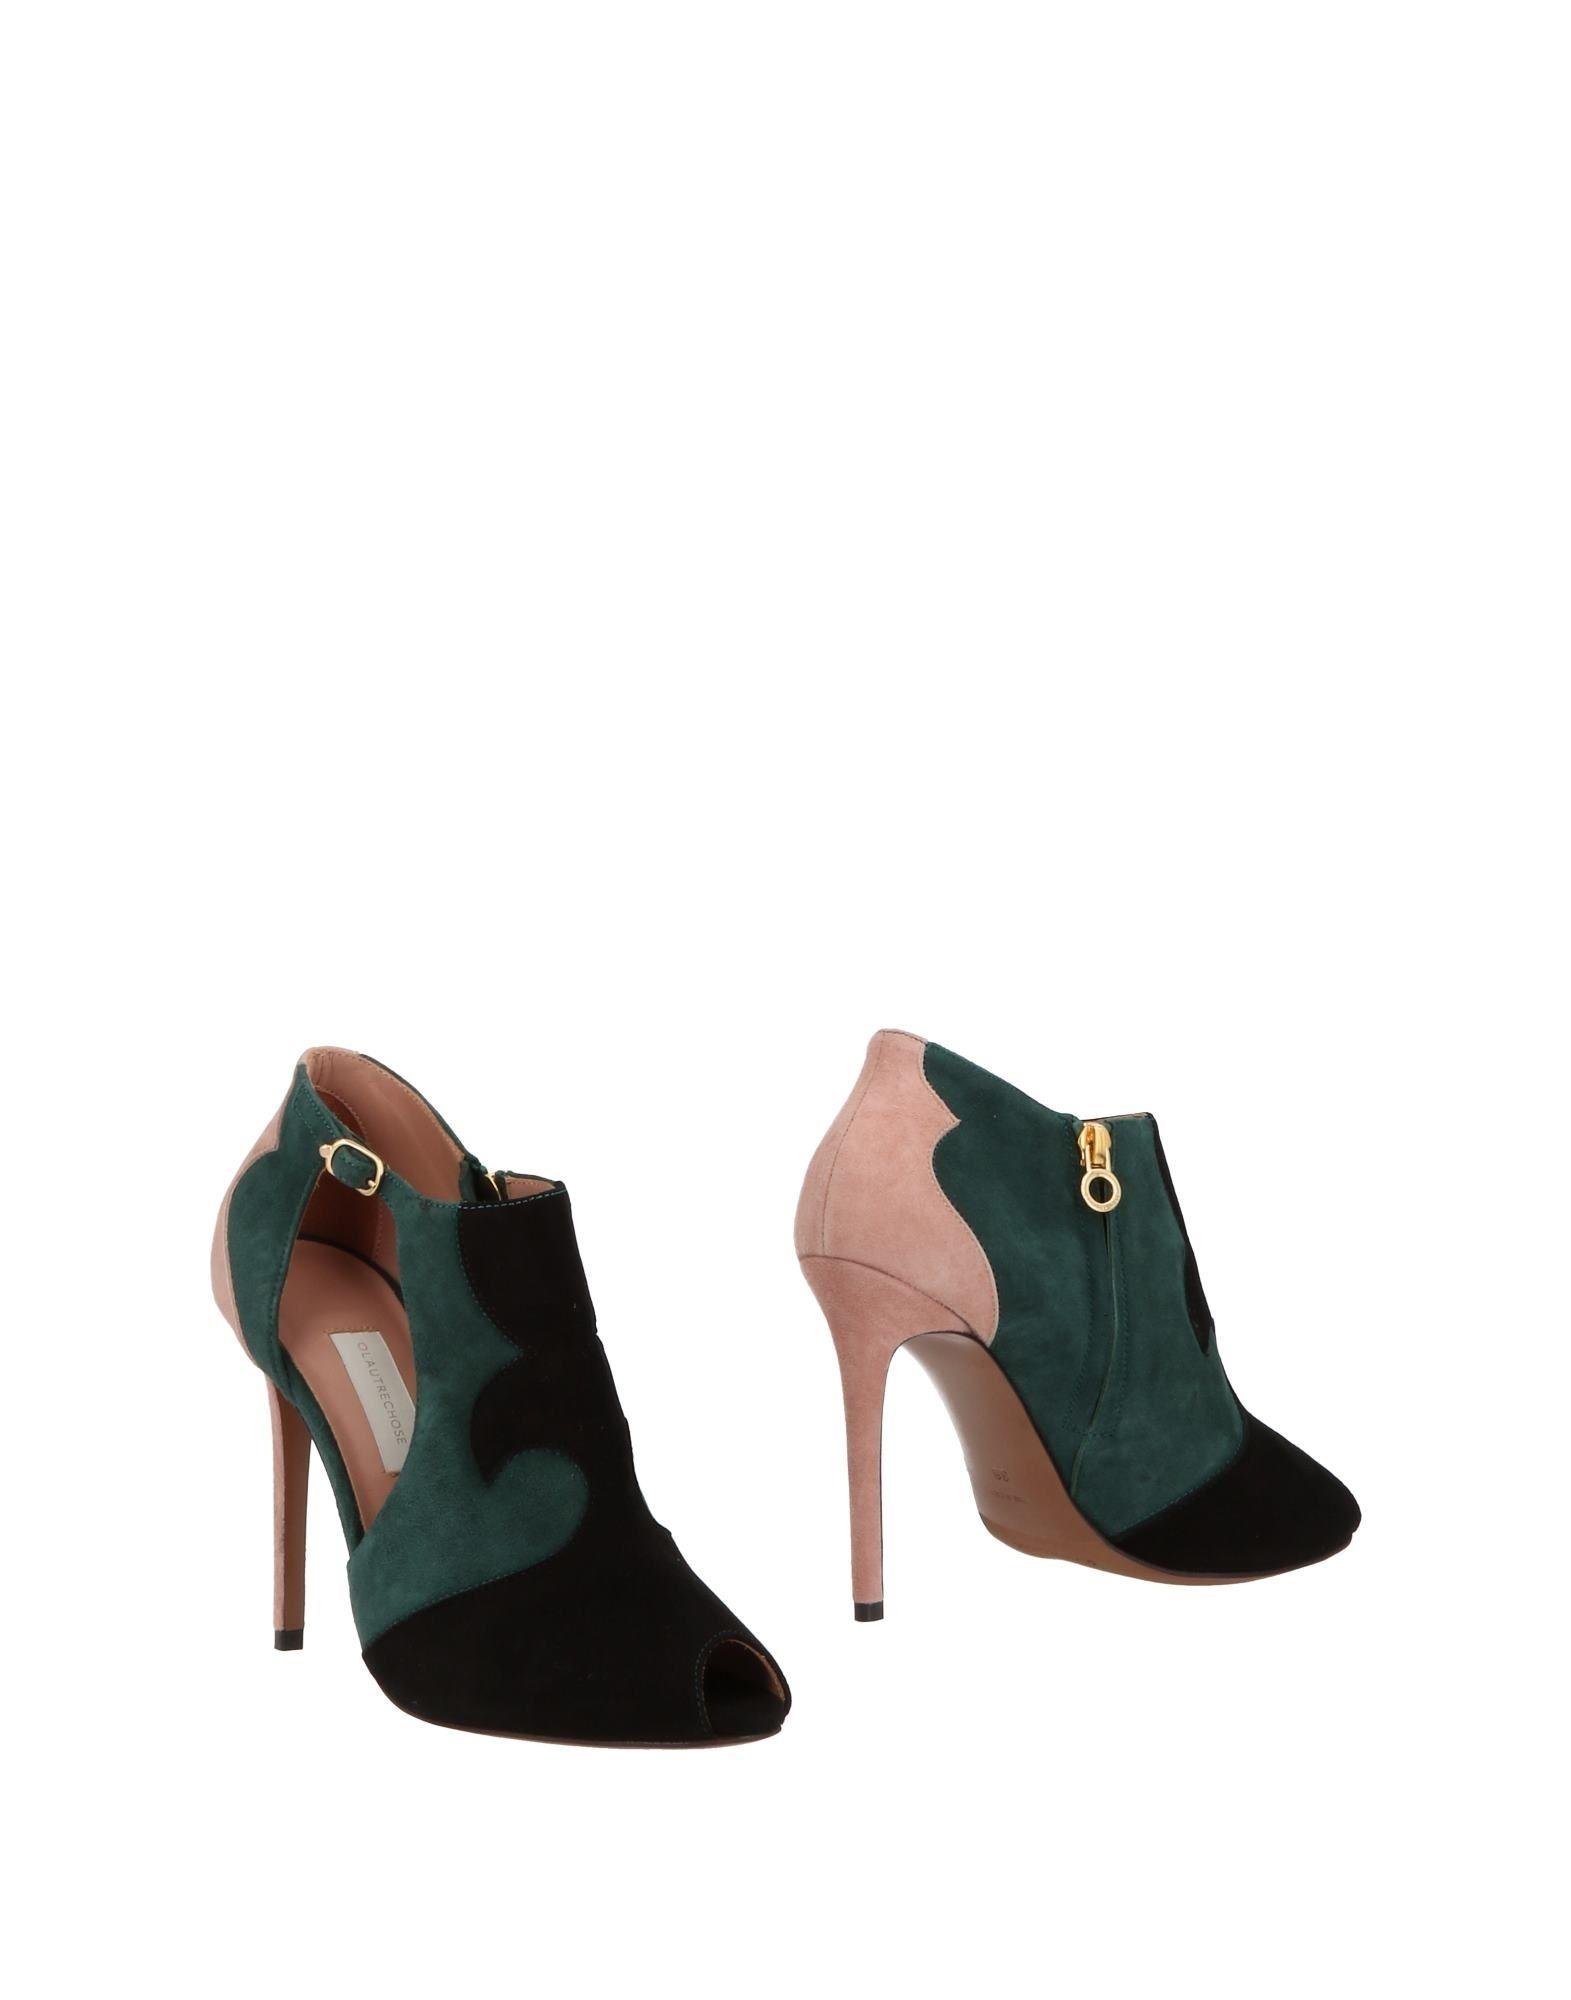 L' Autre Chose 11487645KQGut Stiefelette Damen  11487645KQGut Chose aussehende strapazierfähige Schuhe 22627c